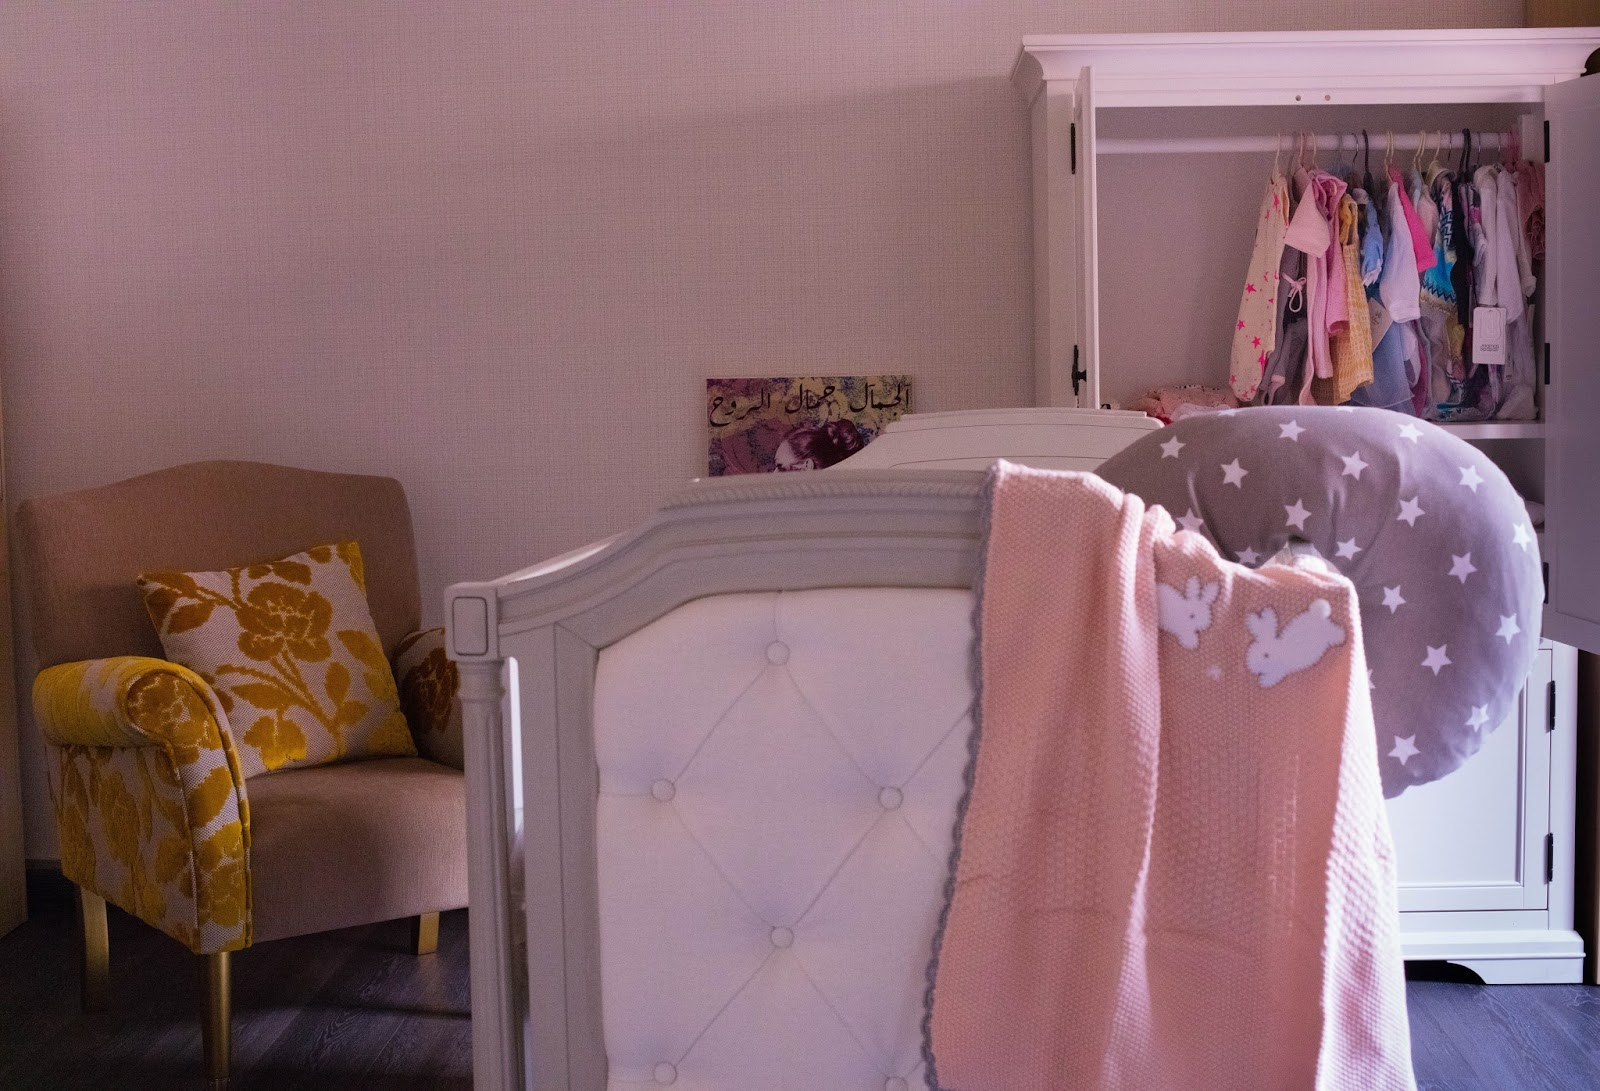 2e55aeaa0 Baby Room Tour on my Youtube Channel | WalaHearts | Bloglovin'